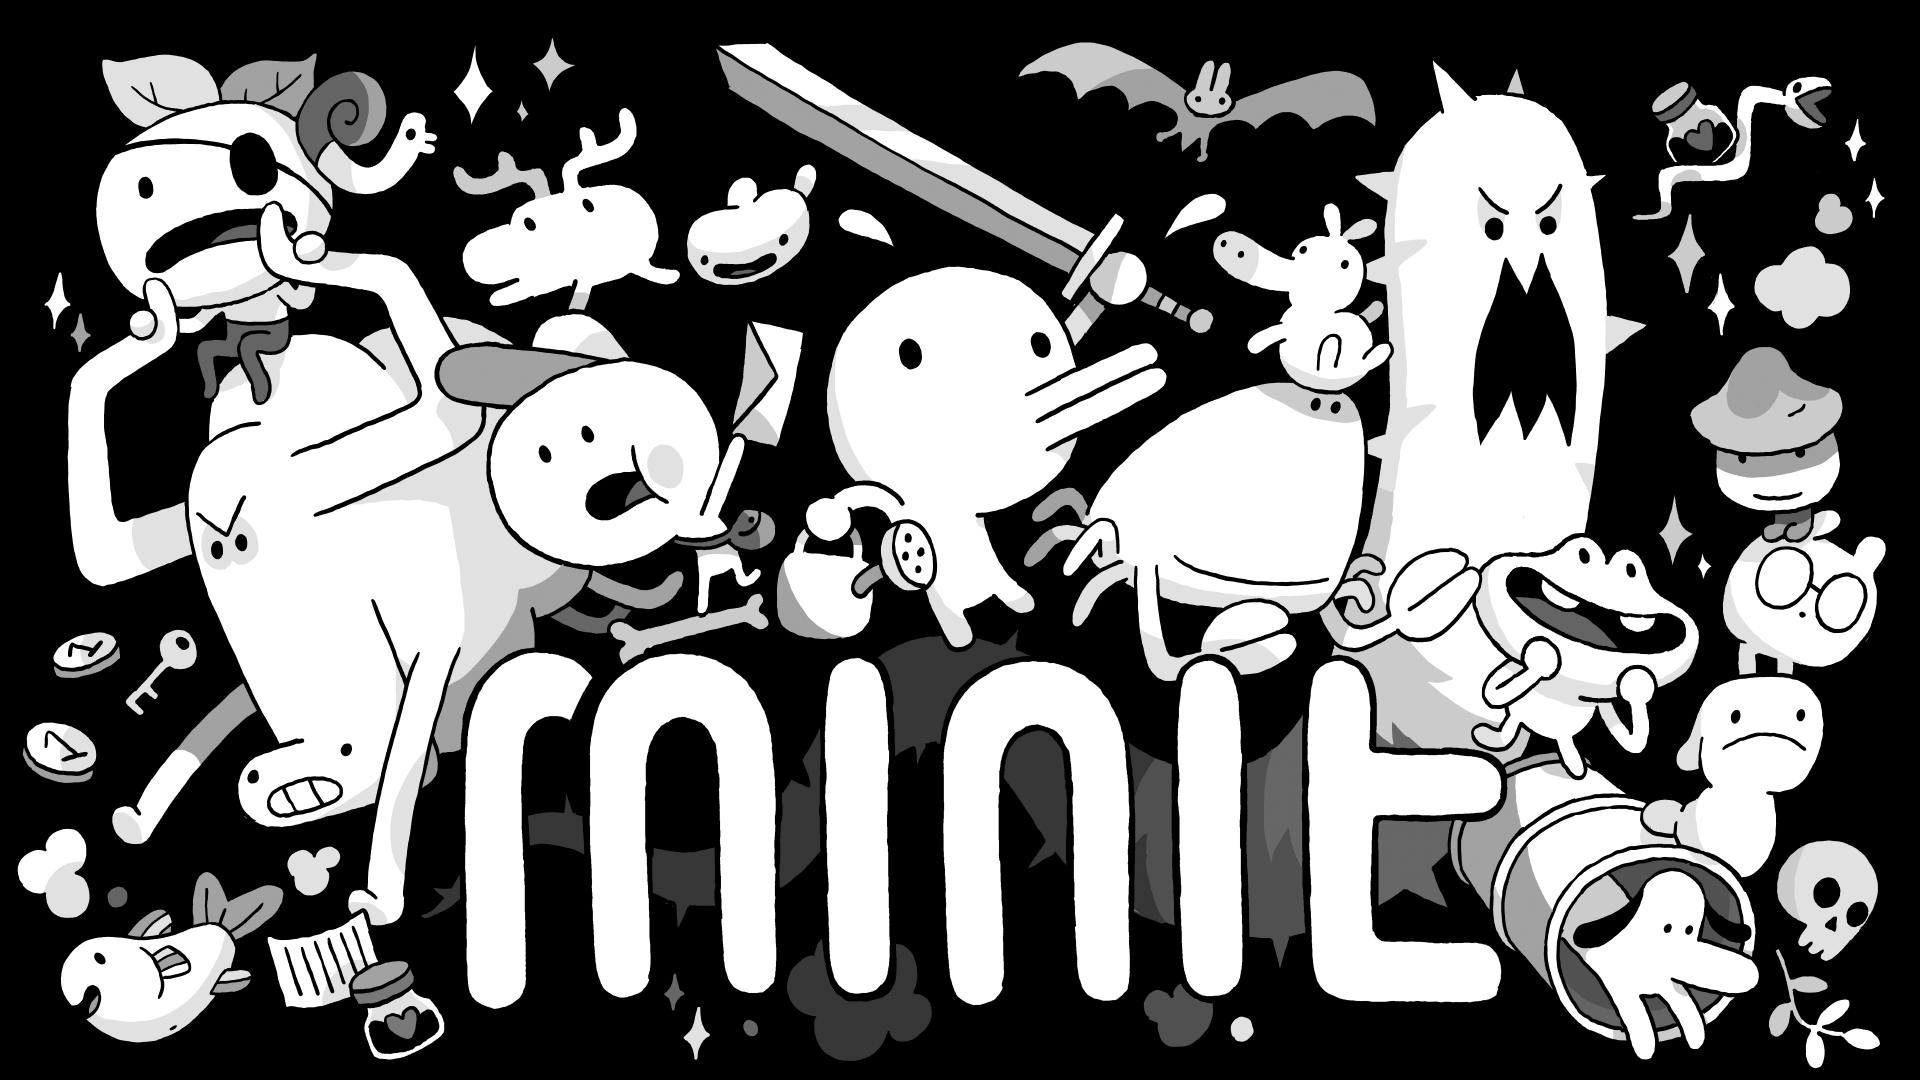 Minit featured